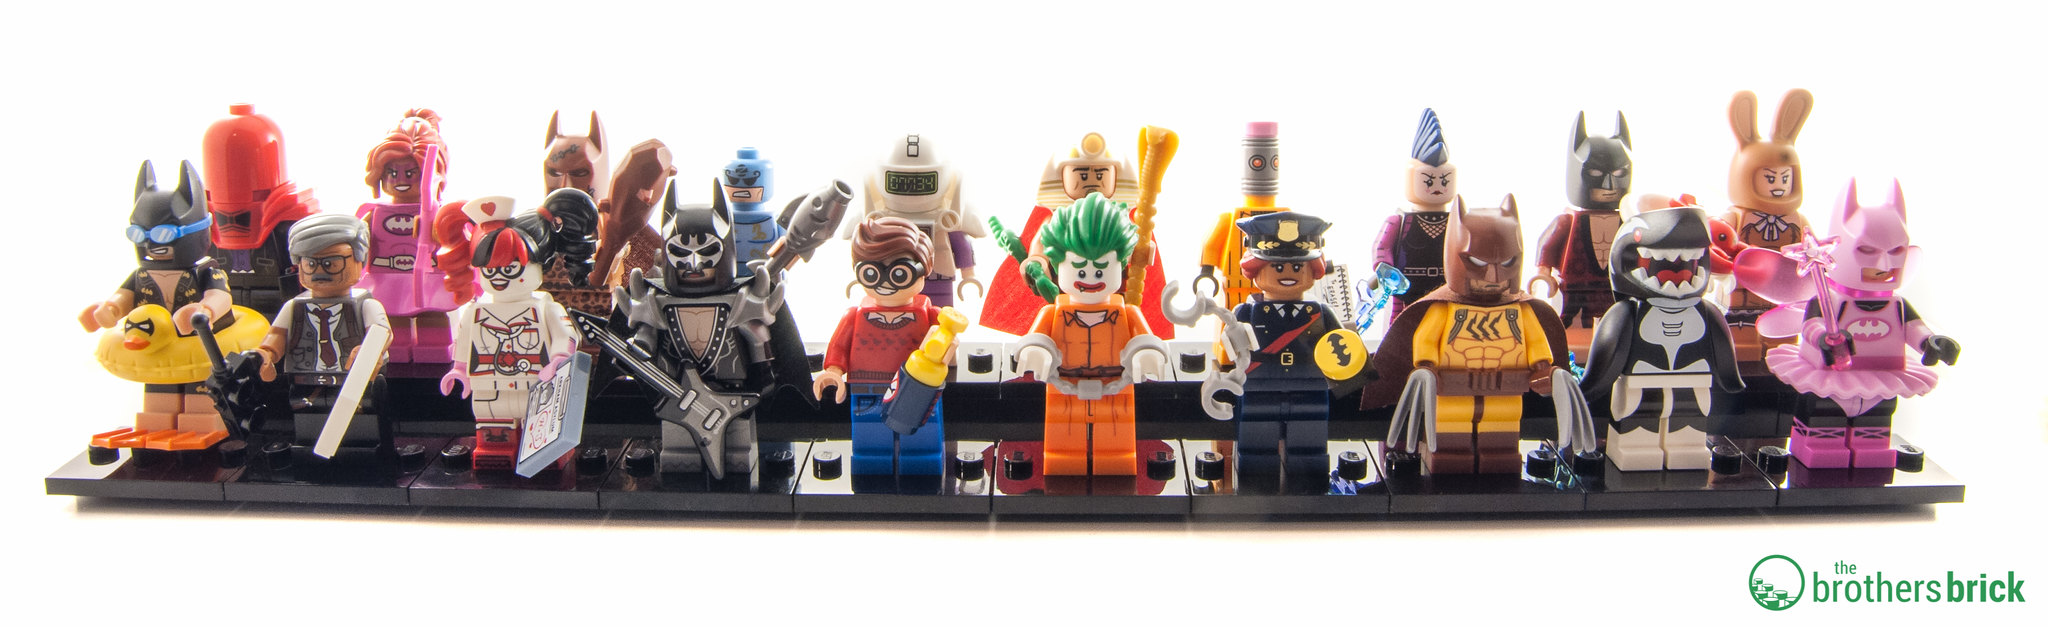 lego batman mini speedwagon instructions